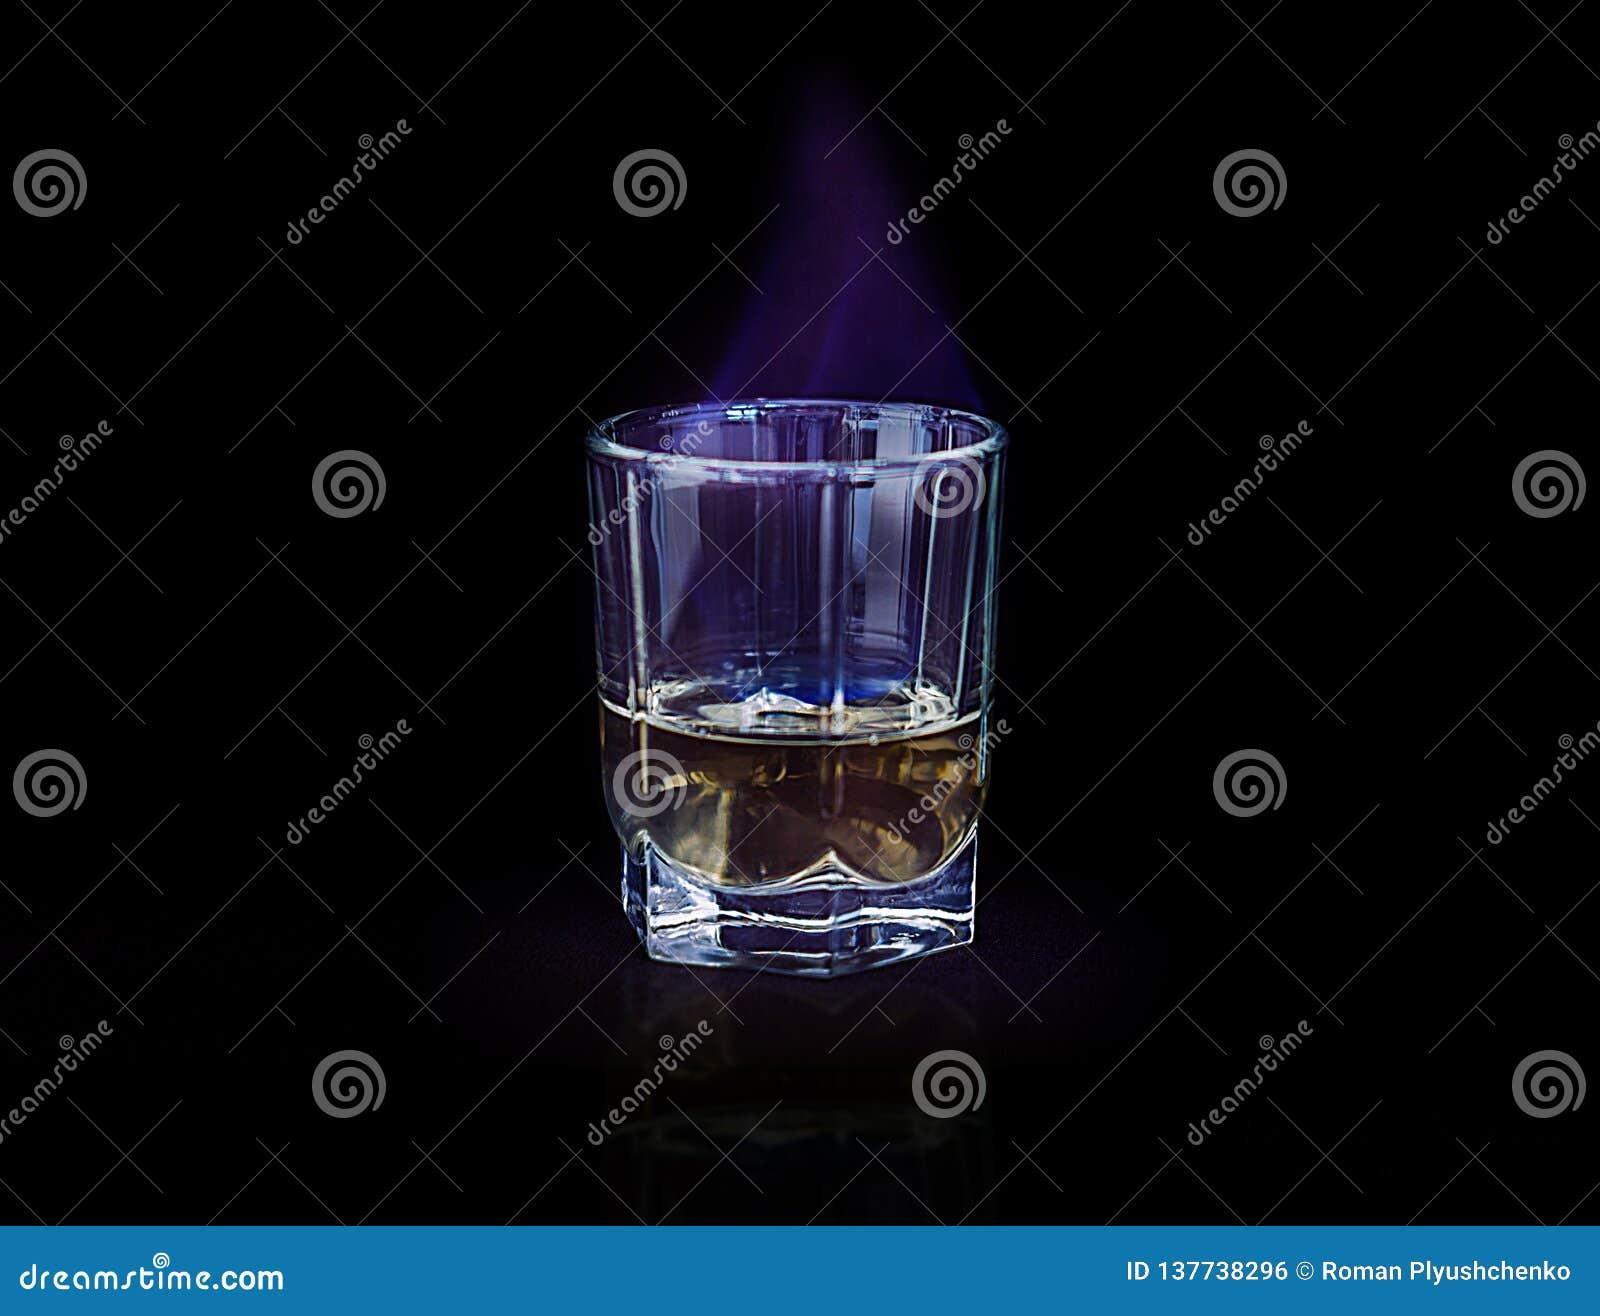 Glas Alkohol blaue Flamme brennend